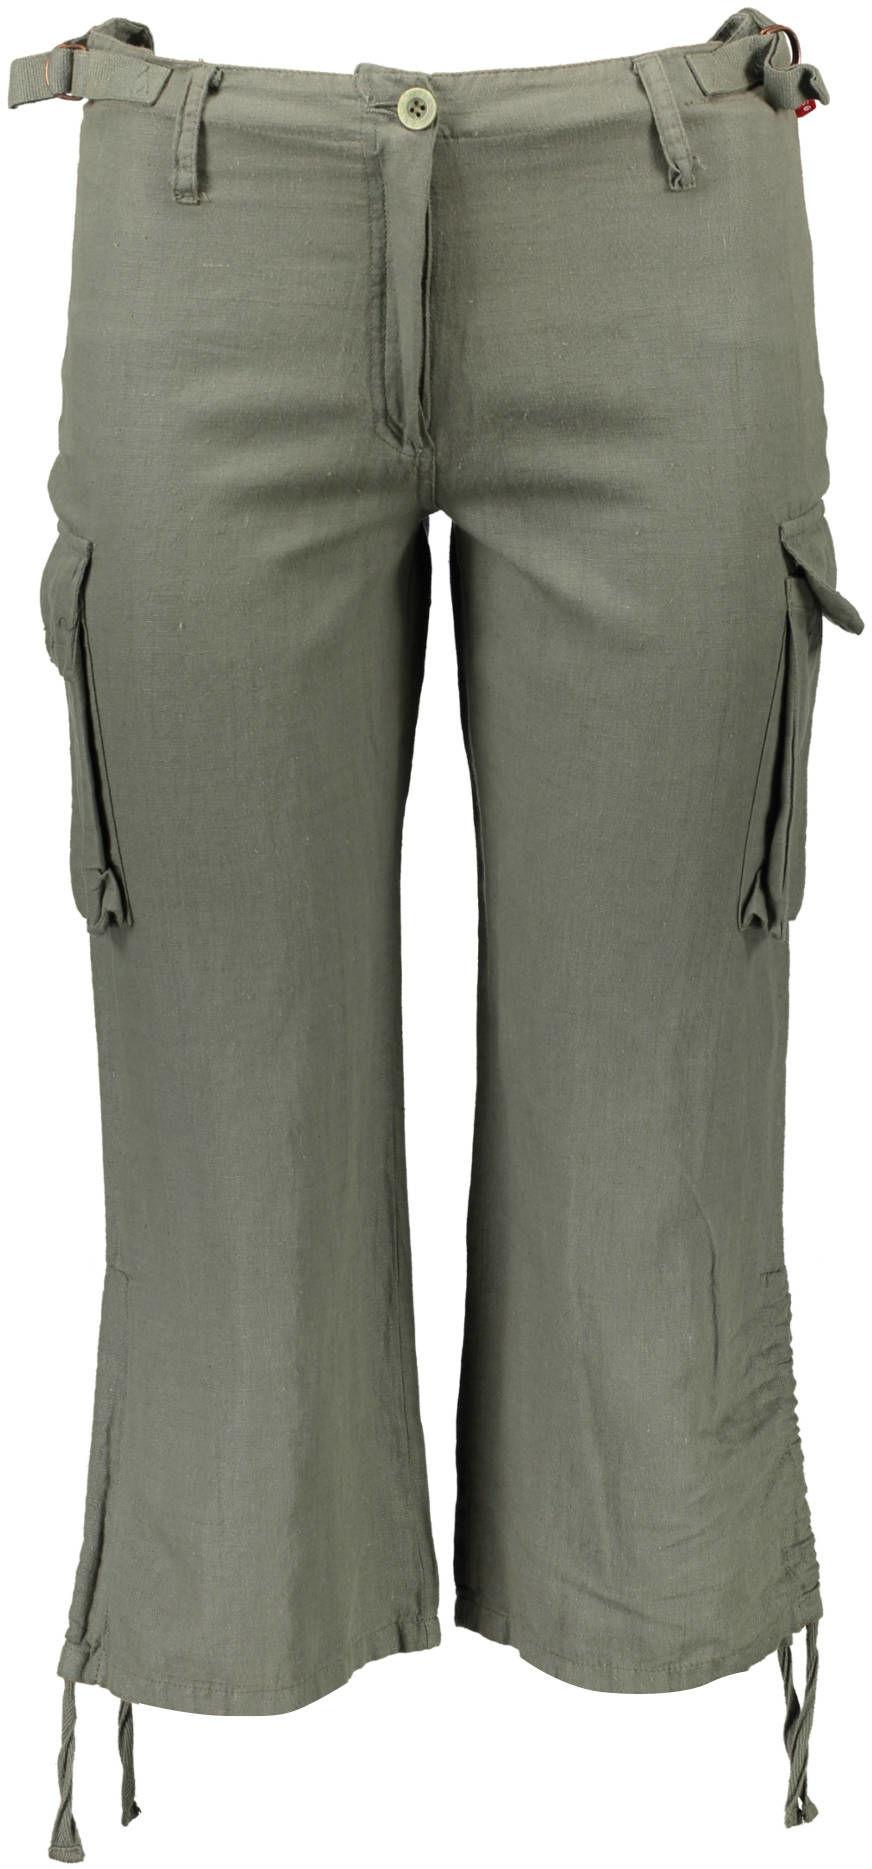 2 spodnie SPECJALNE Capri Damskie